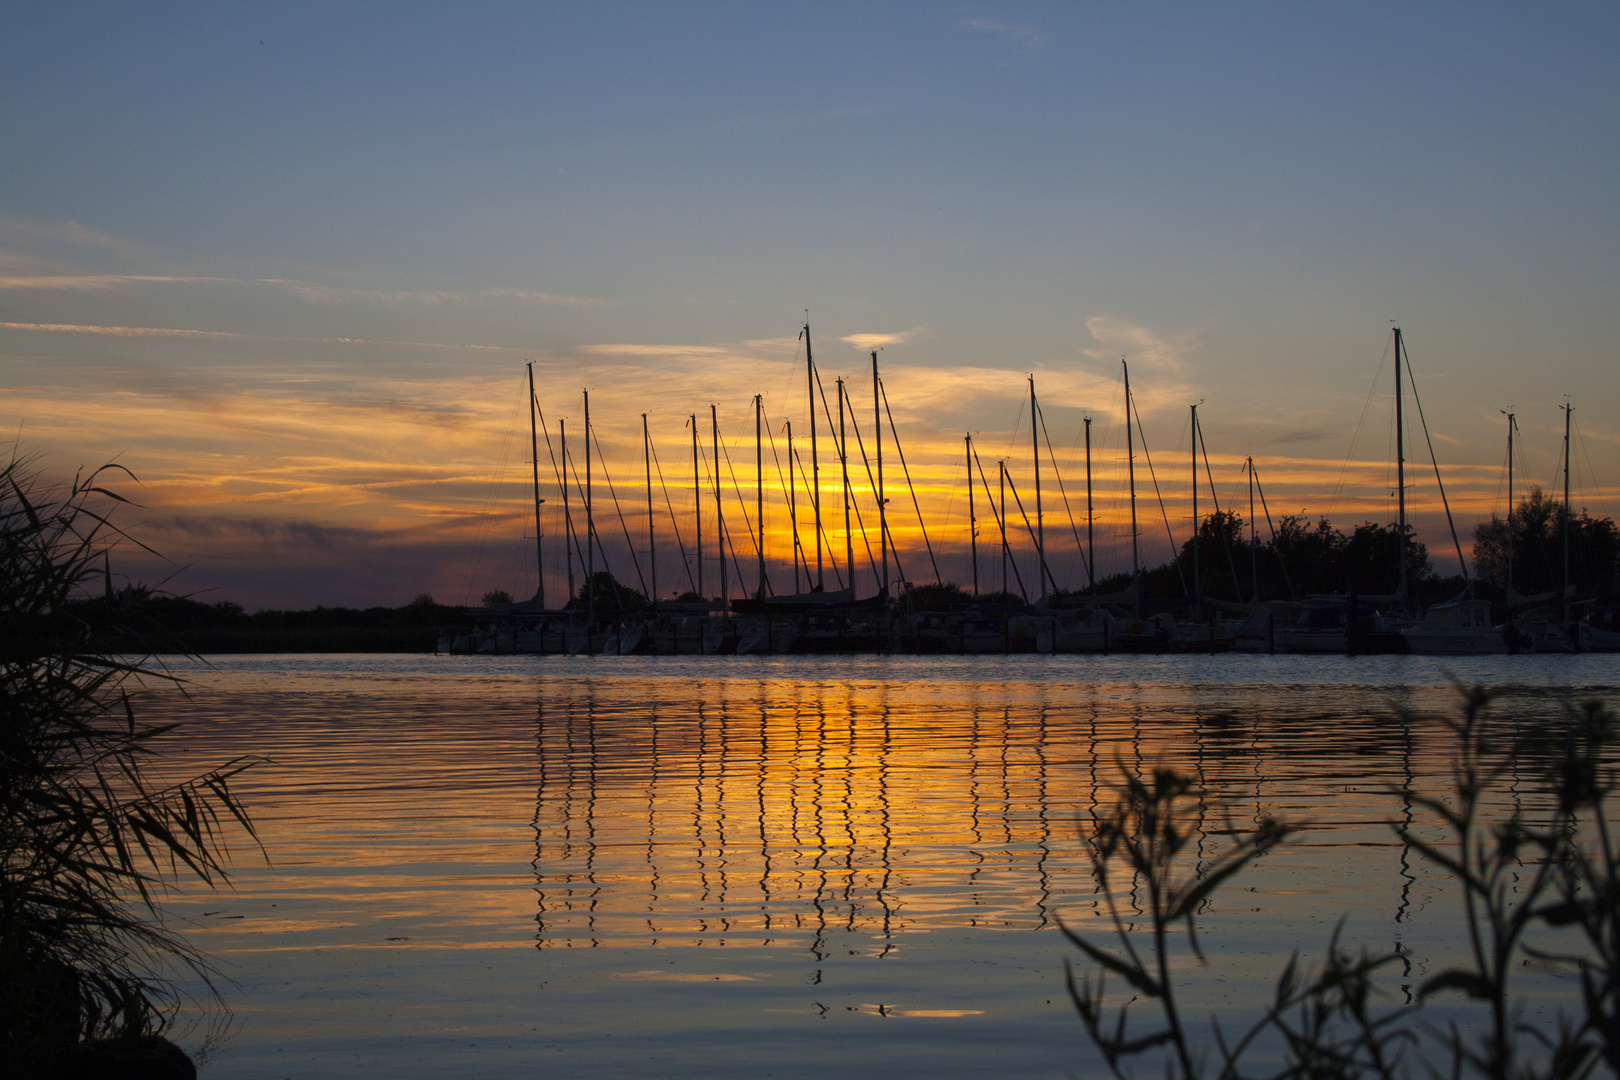 Sonnenuntergang am Ryck 2